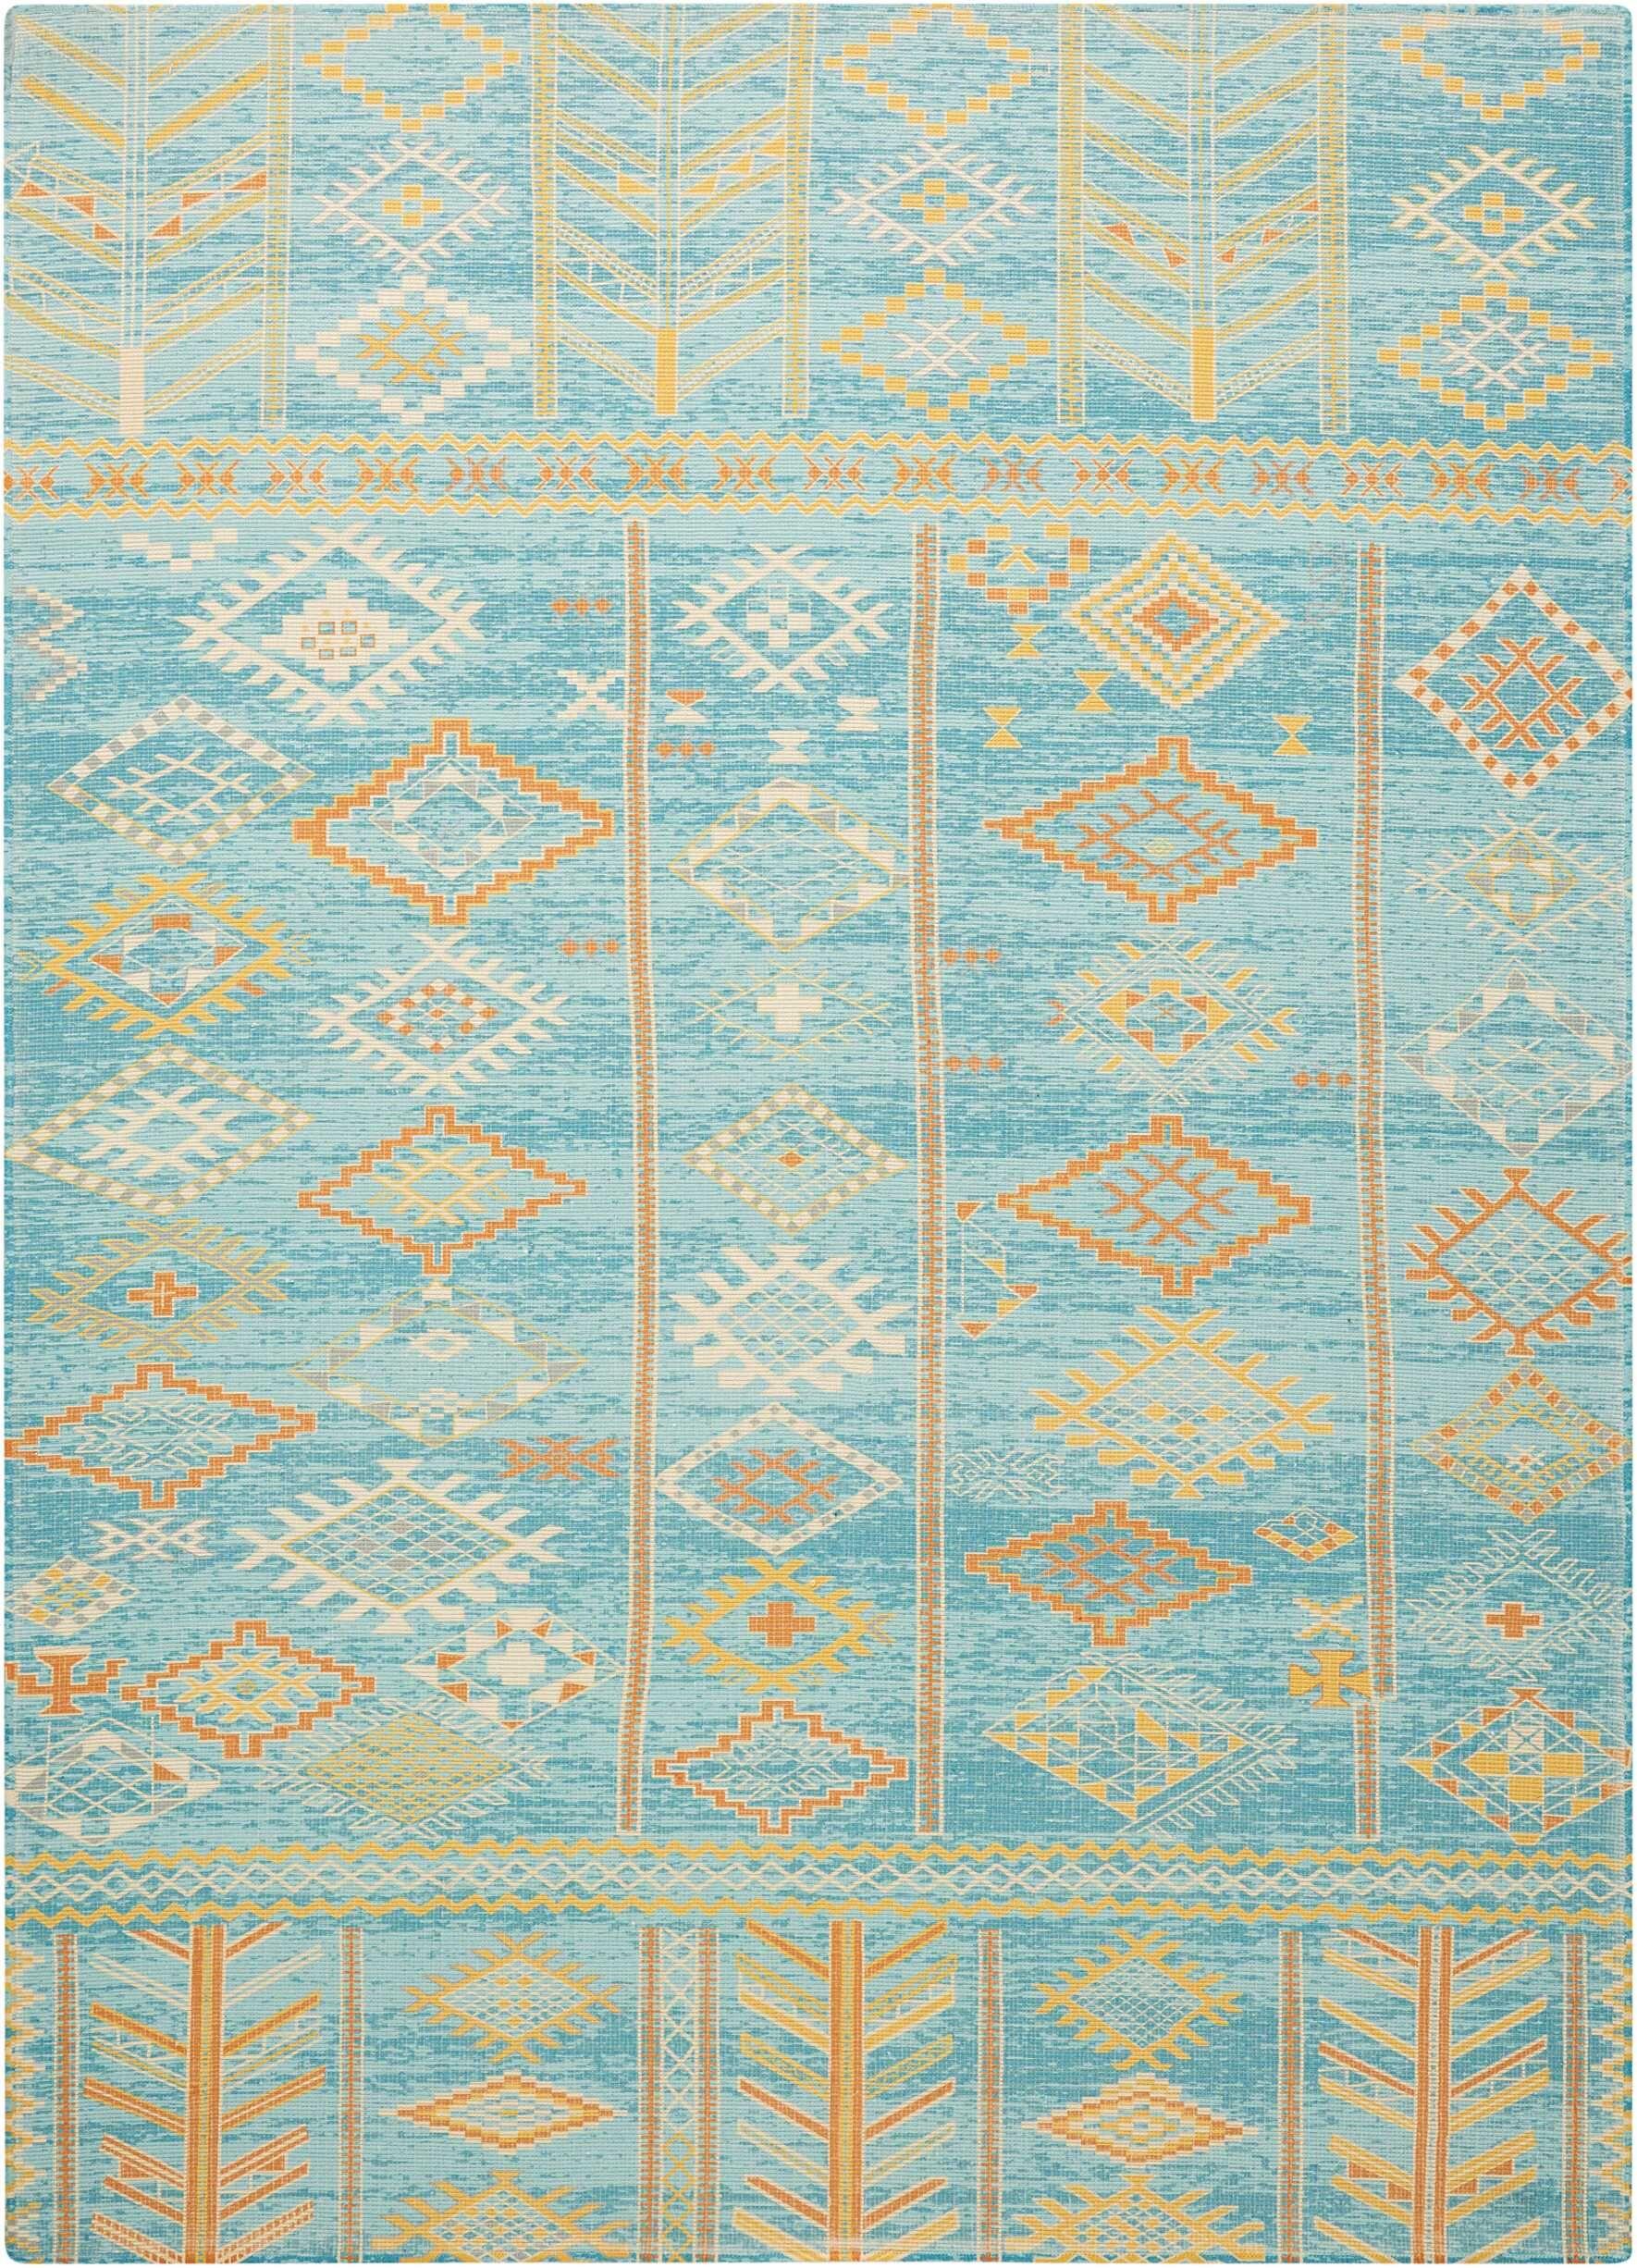 Wilkerson Sky Blue Area Rug Rug Size: Rectangle 3'6